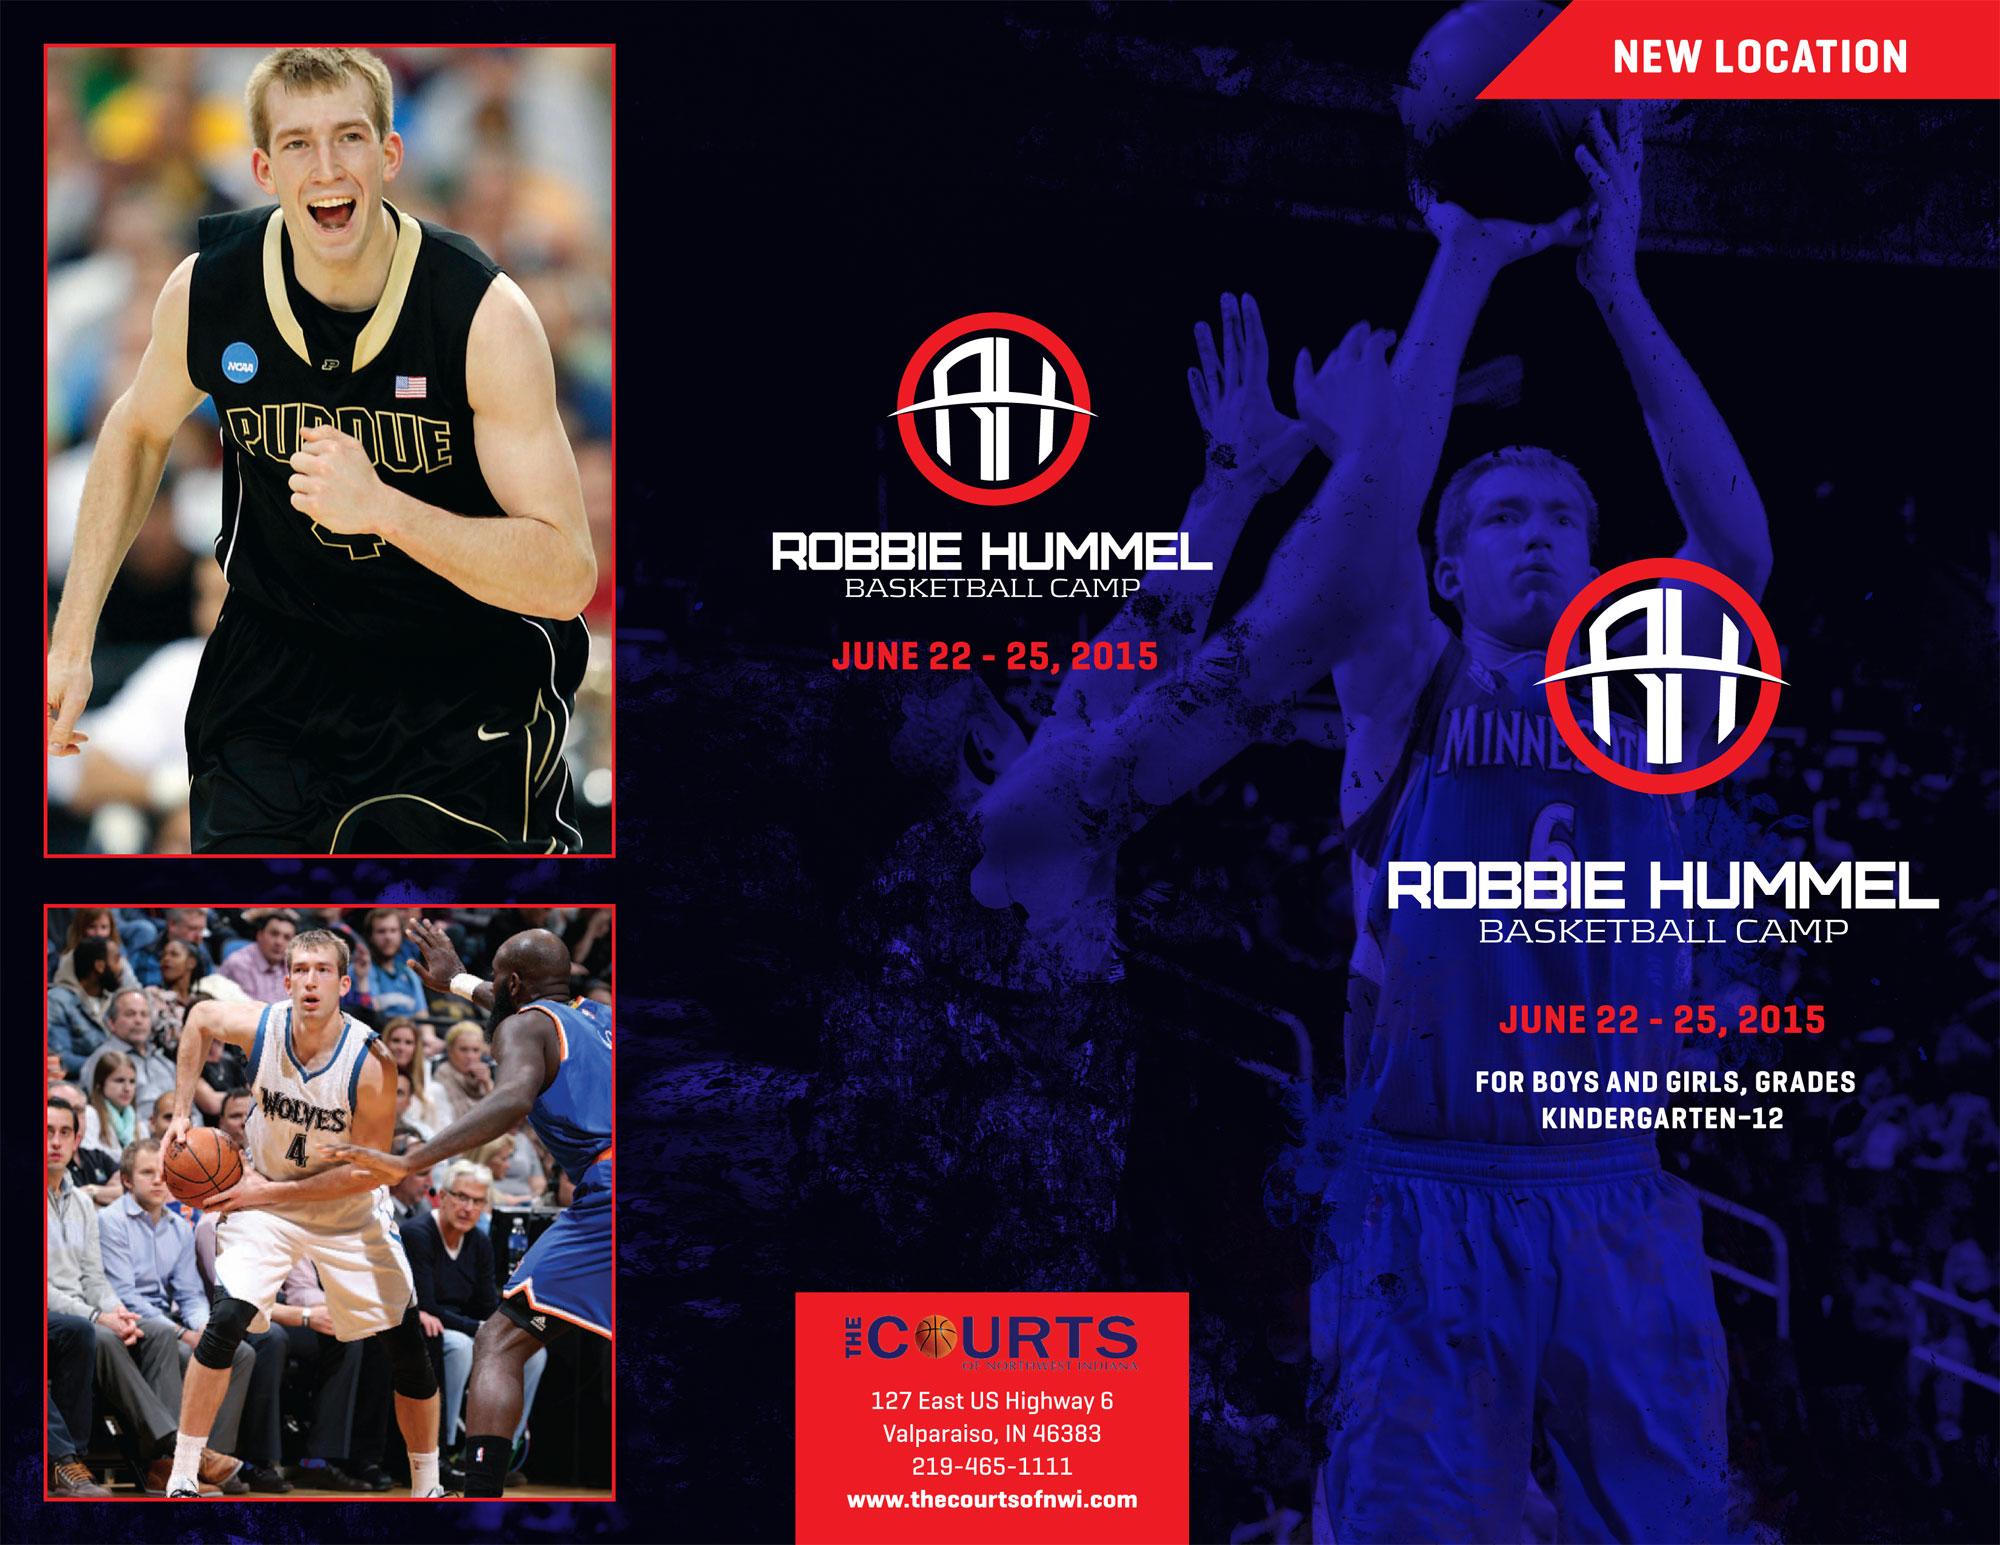 Robbie Hummel Basketball Camp Returns to NWI June 22-25